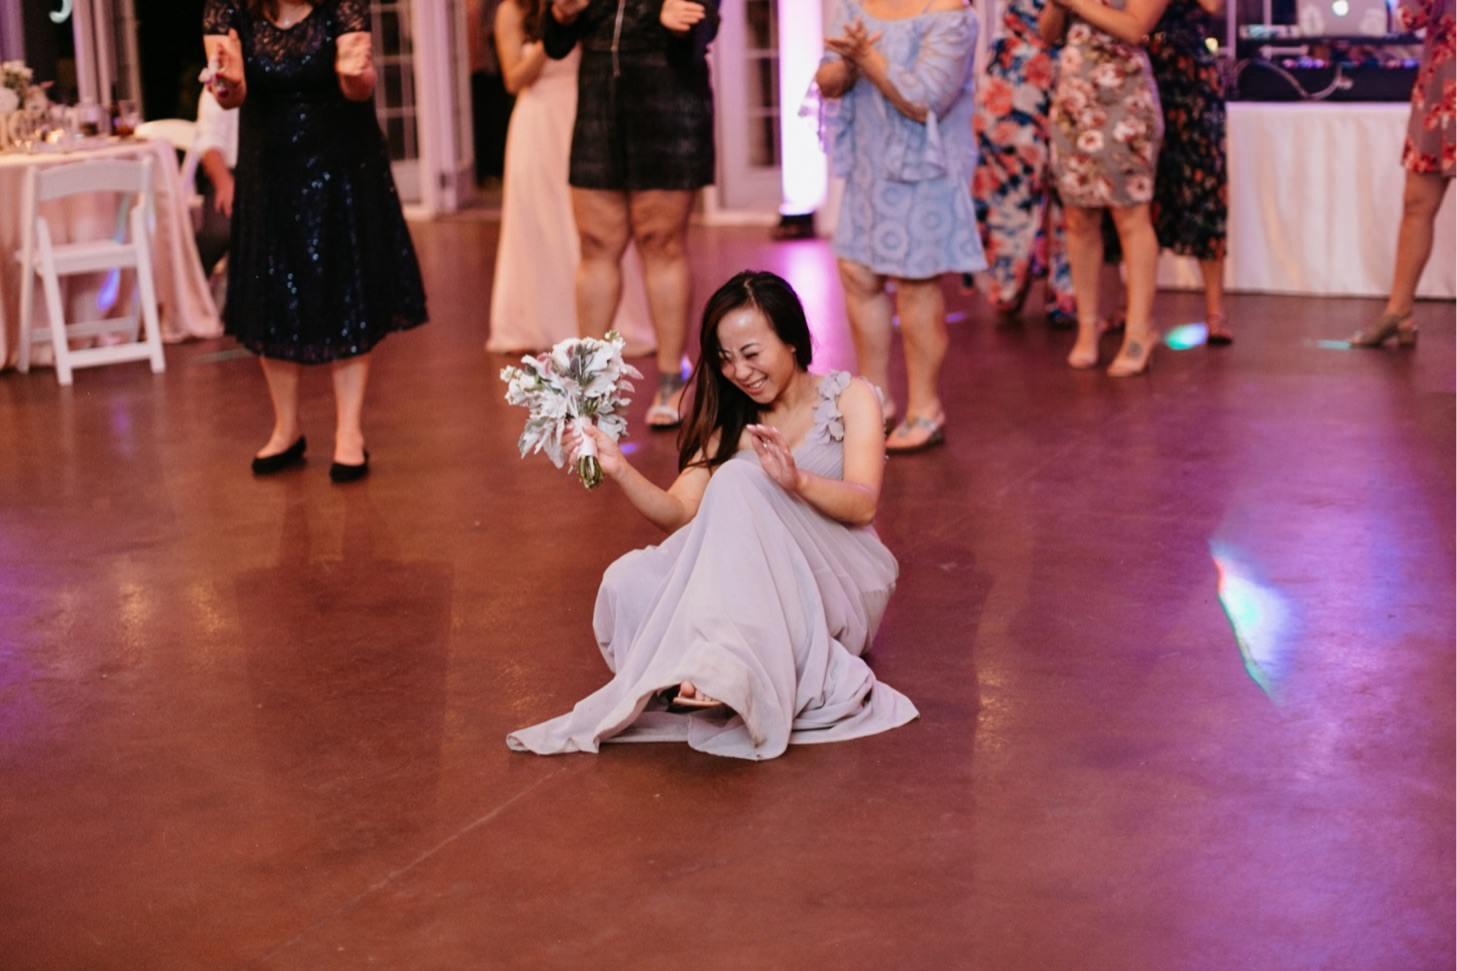 ritz-charles-wedding-reception-downtown-indianapolis-wedding-photographer073.JPG